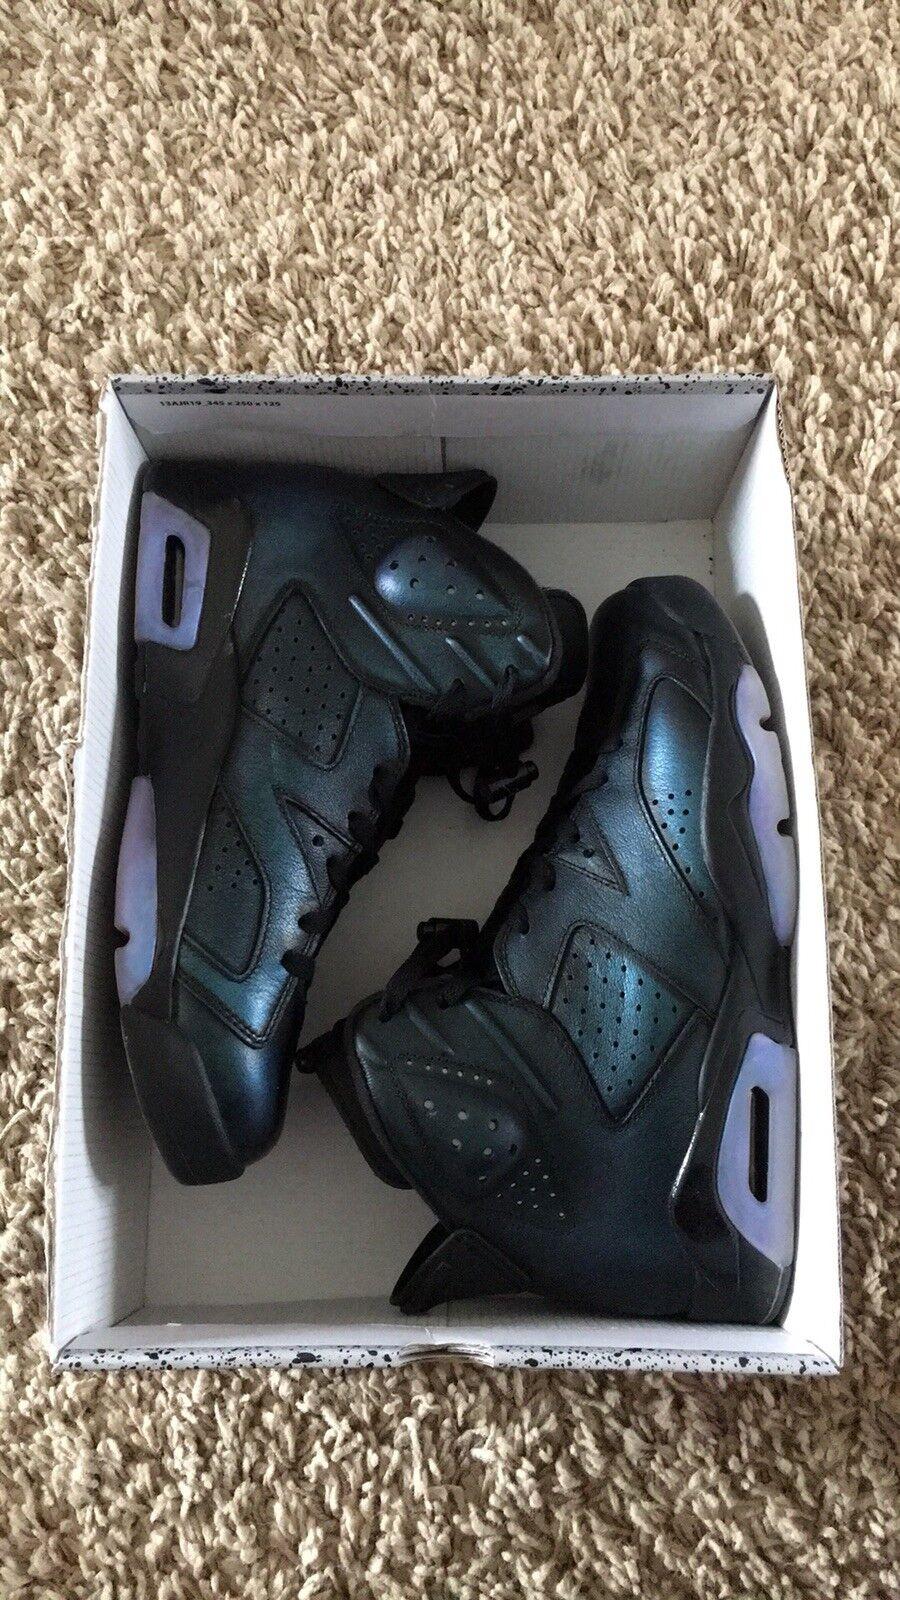 Nike air jordan retrò 6 dimensioni camaleonte all - star come 907961-015 - 5 / 5093